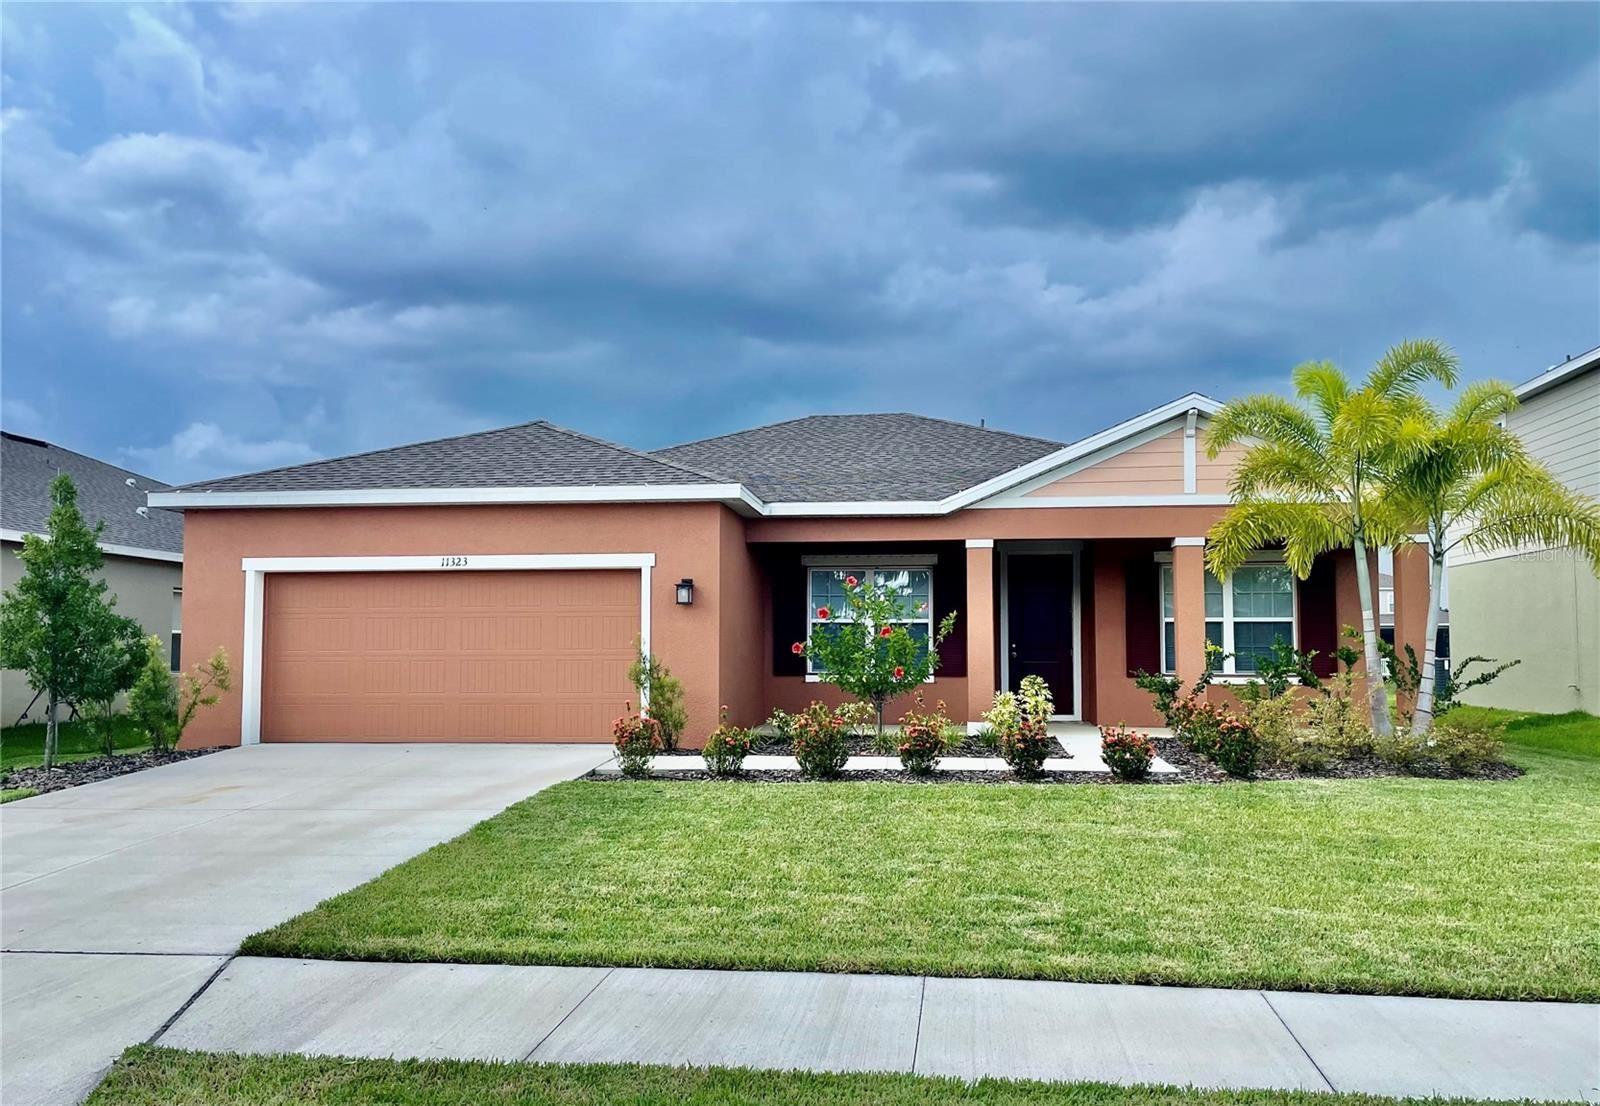 11323 63RD ST E, Parrish, FL 34219 - #: A4508009